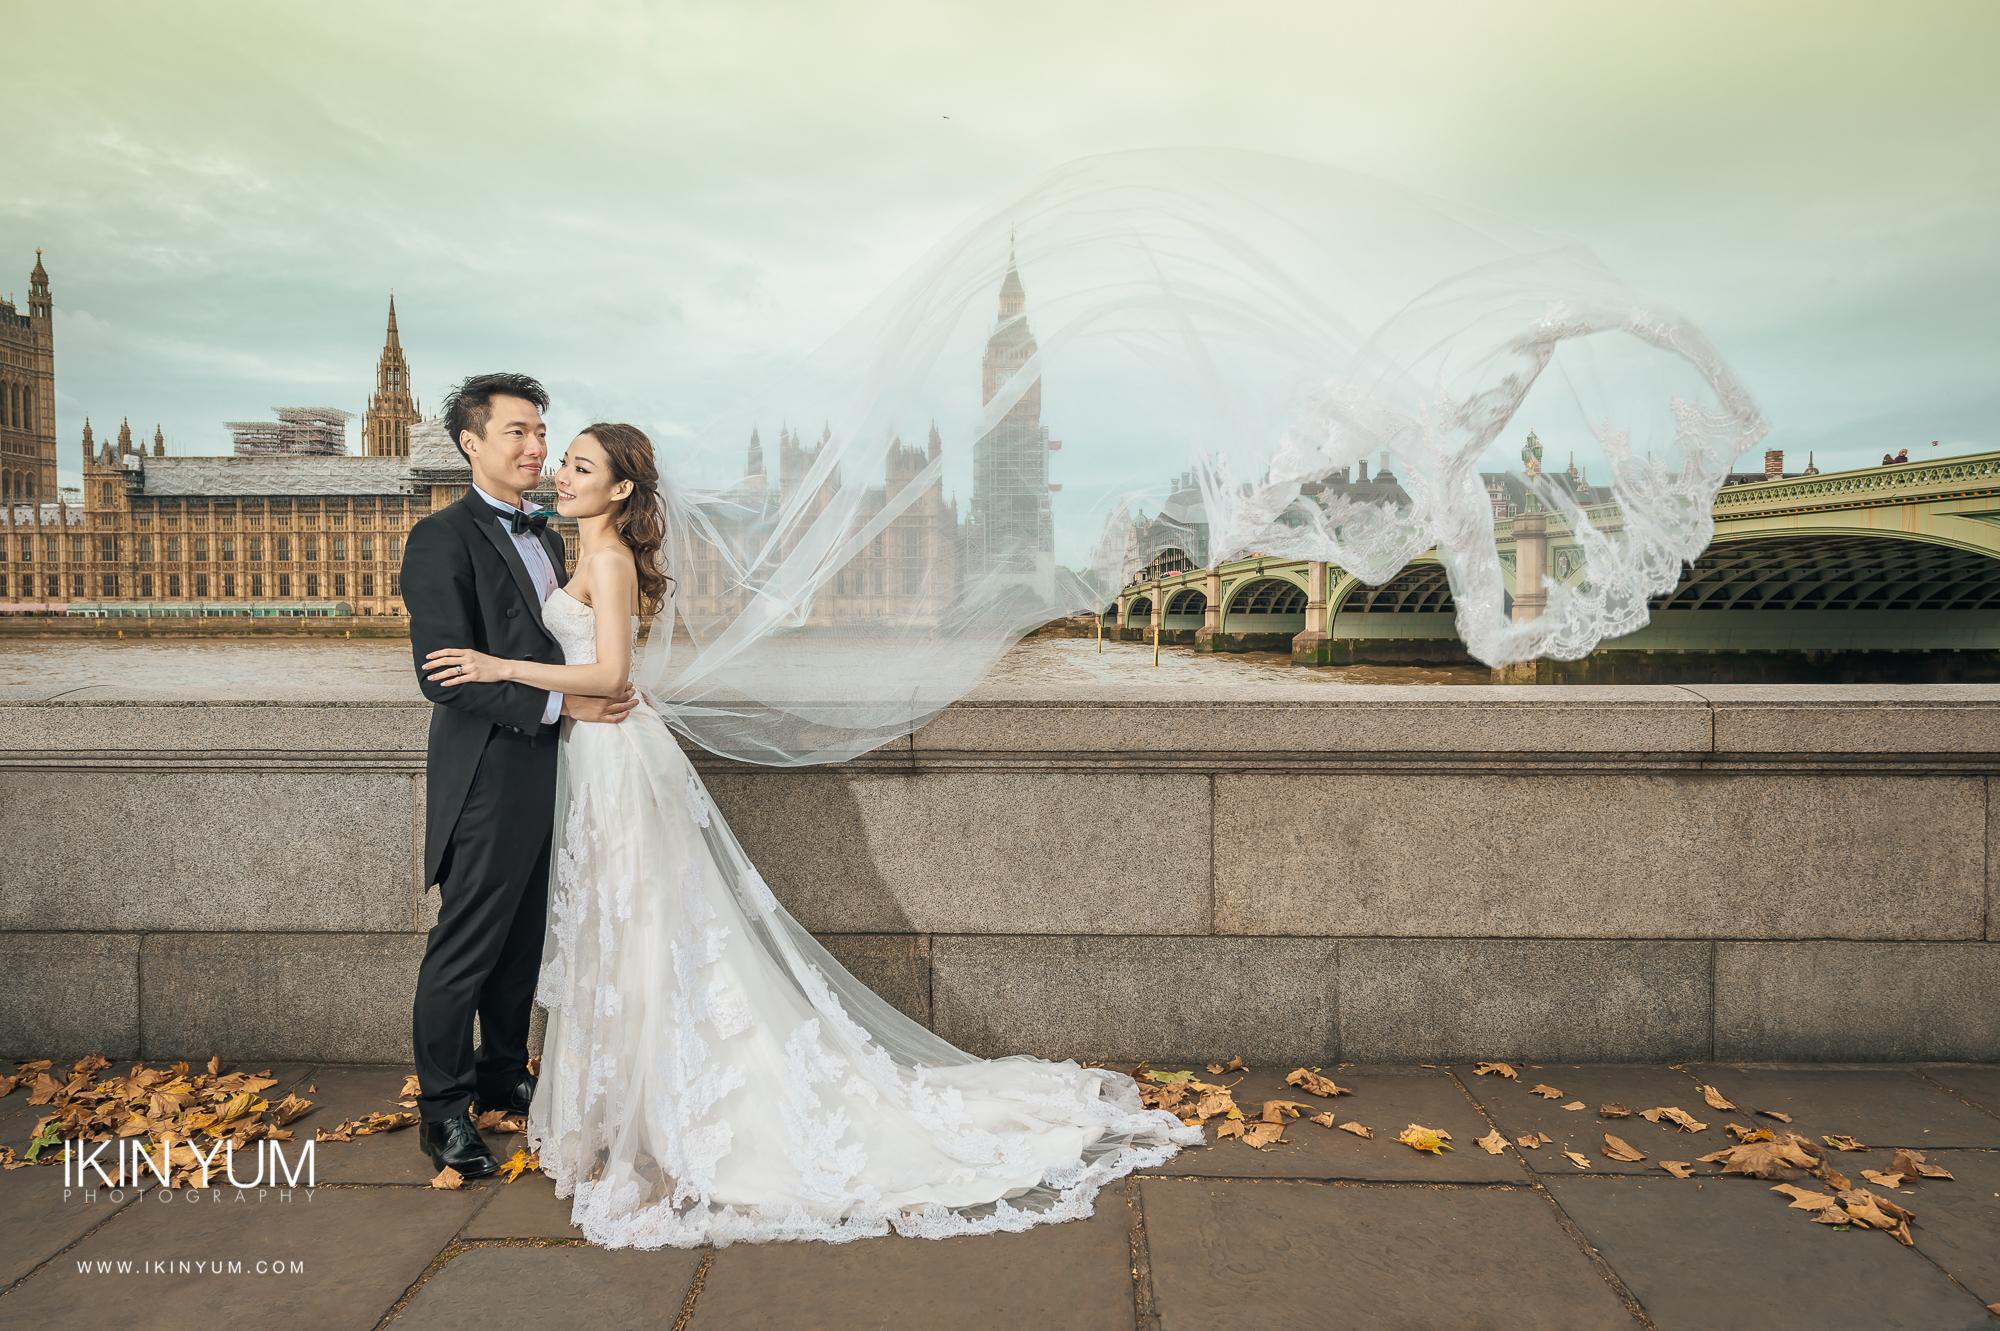 Yannis & Kenny Pre-Wedding Shoot - Ikin Yum Photography-0097.jpg